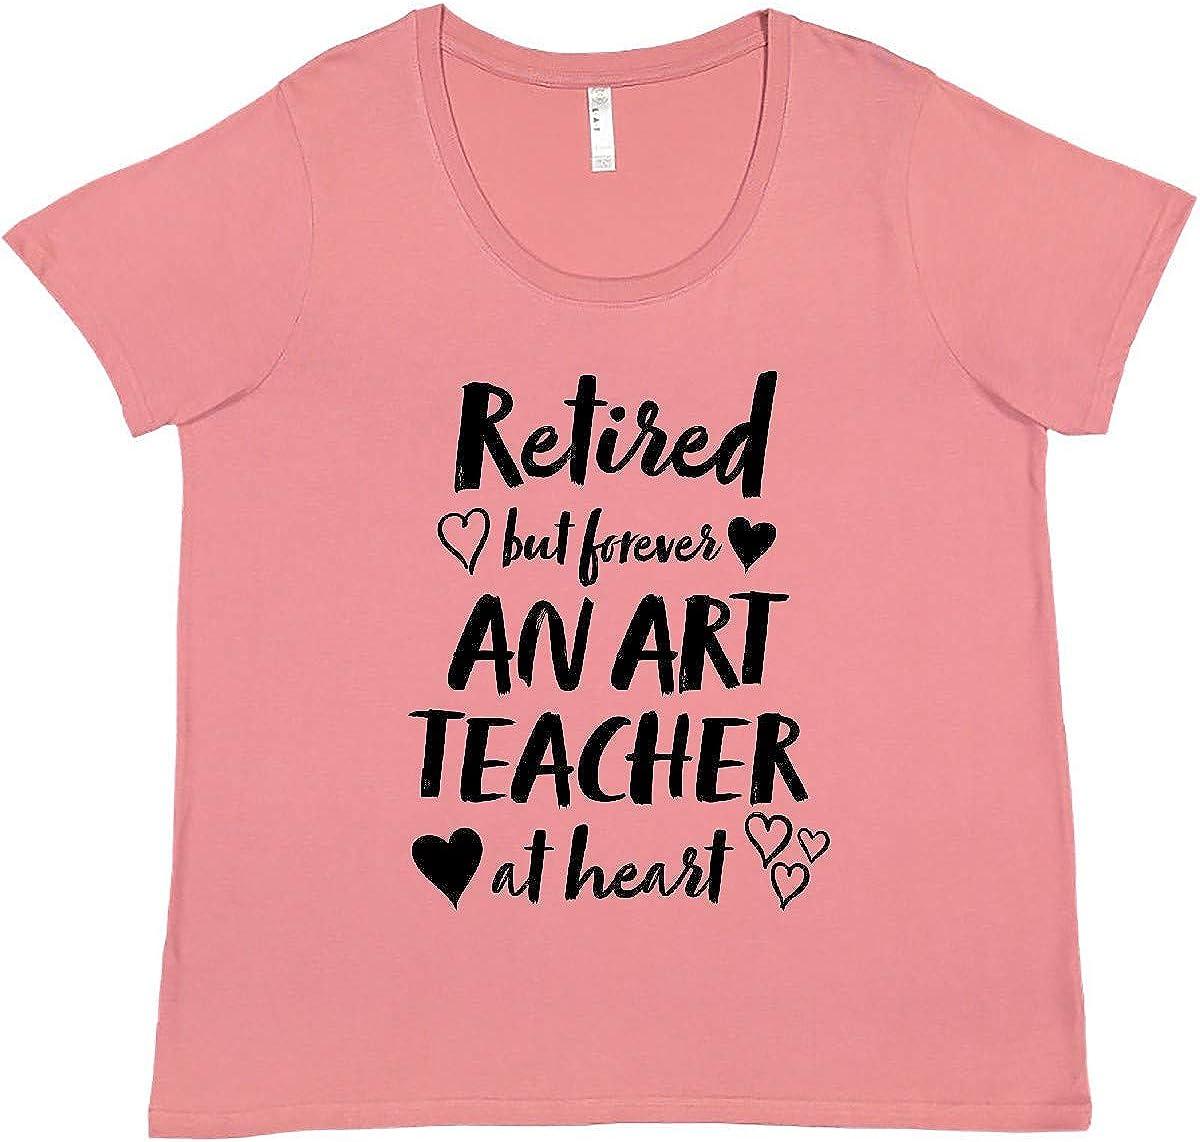 inktastic High quality Retired But Forever an Art Teacher Japan Maker New Heart Pl Women's at